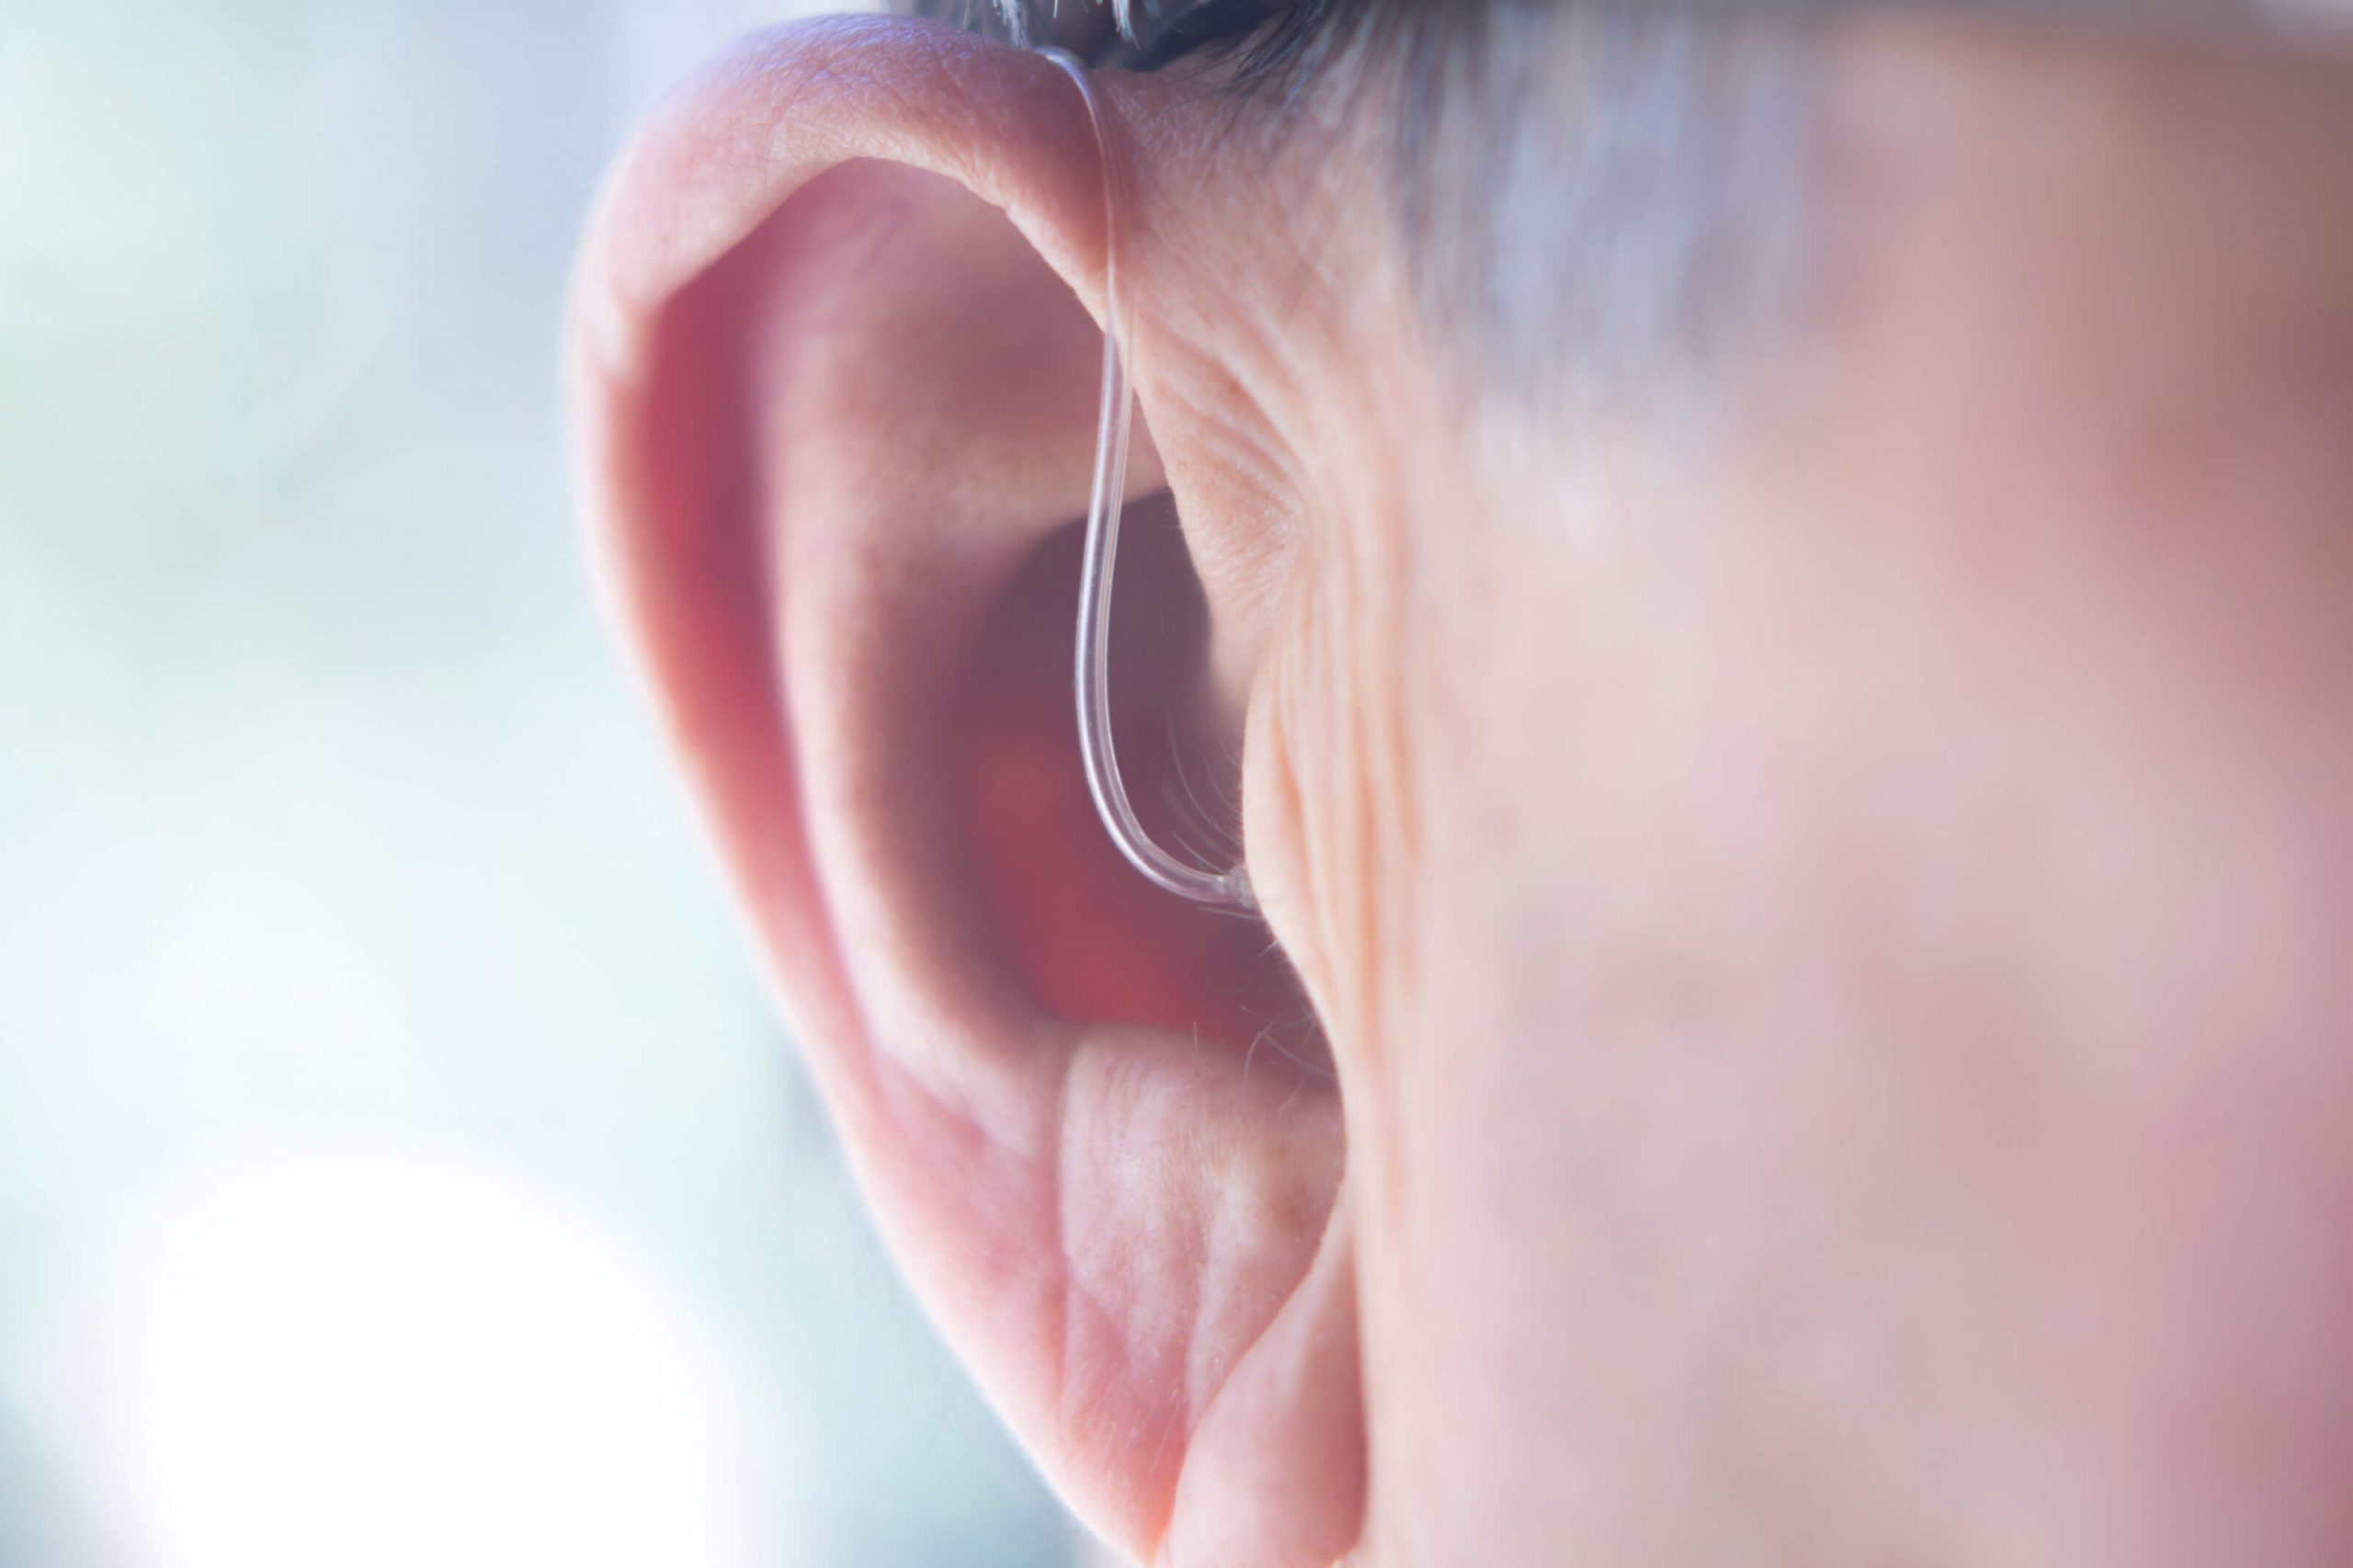 hearing aid inside ear